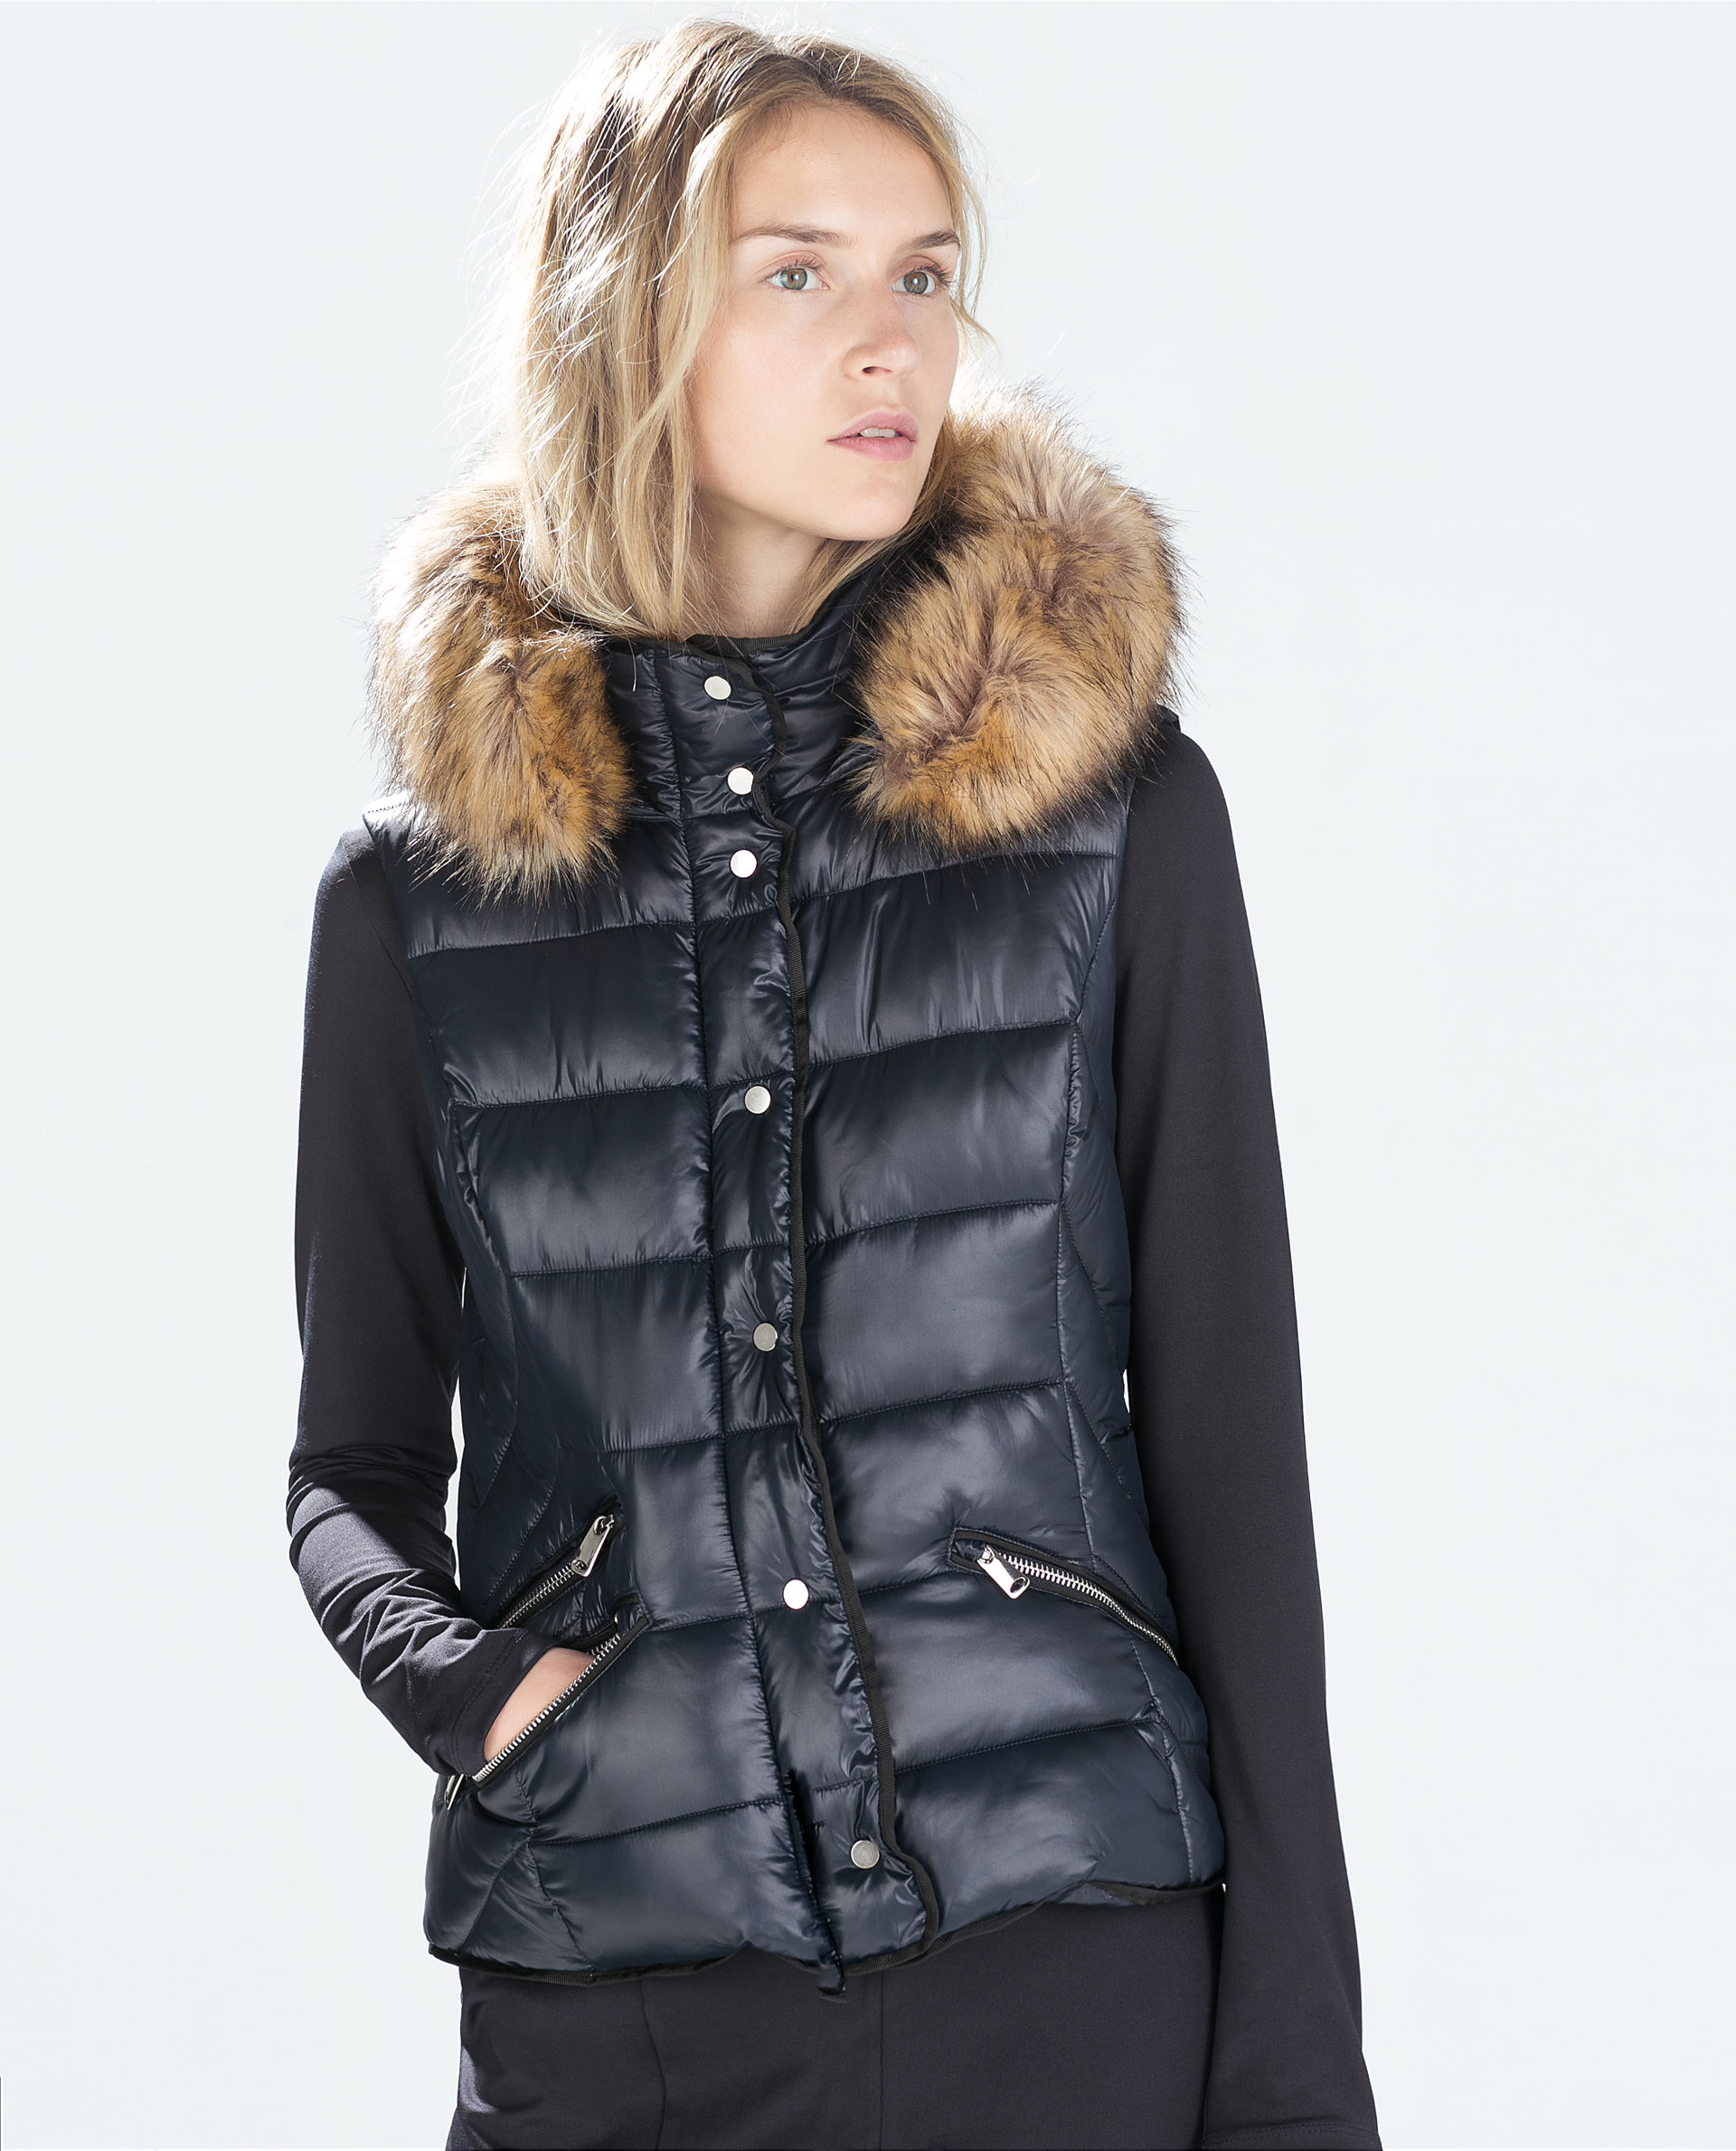 puffer vest gallery. womenu0027s puffer jackets XWLSYFS